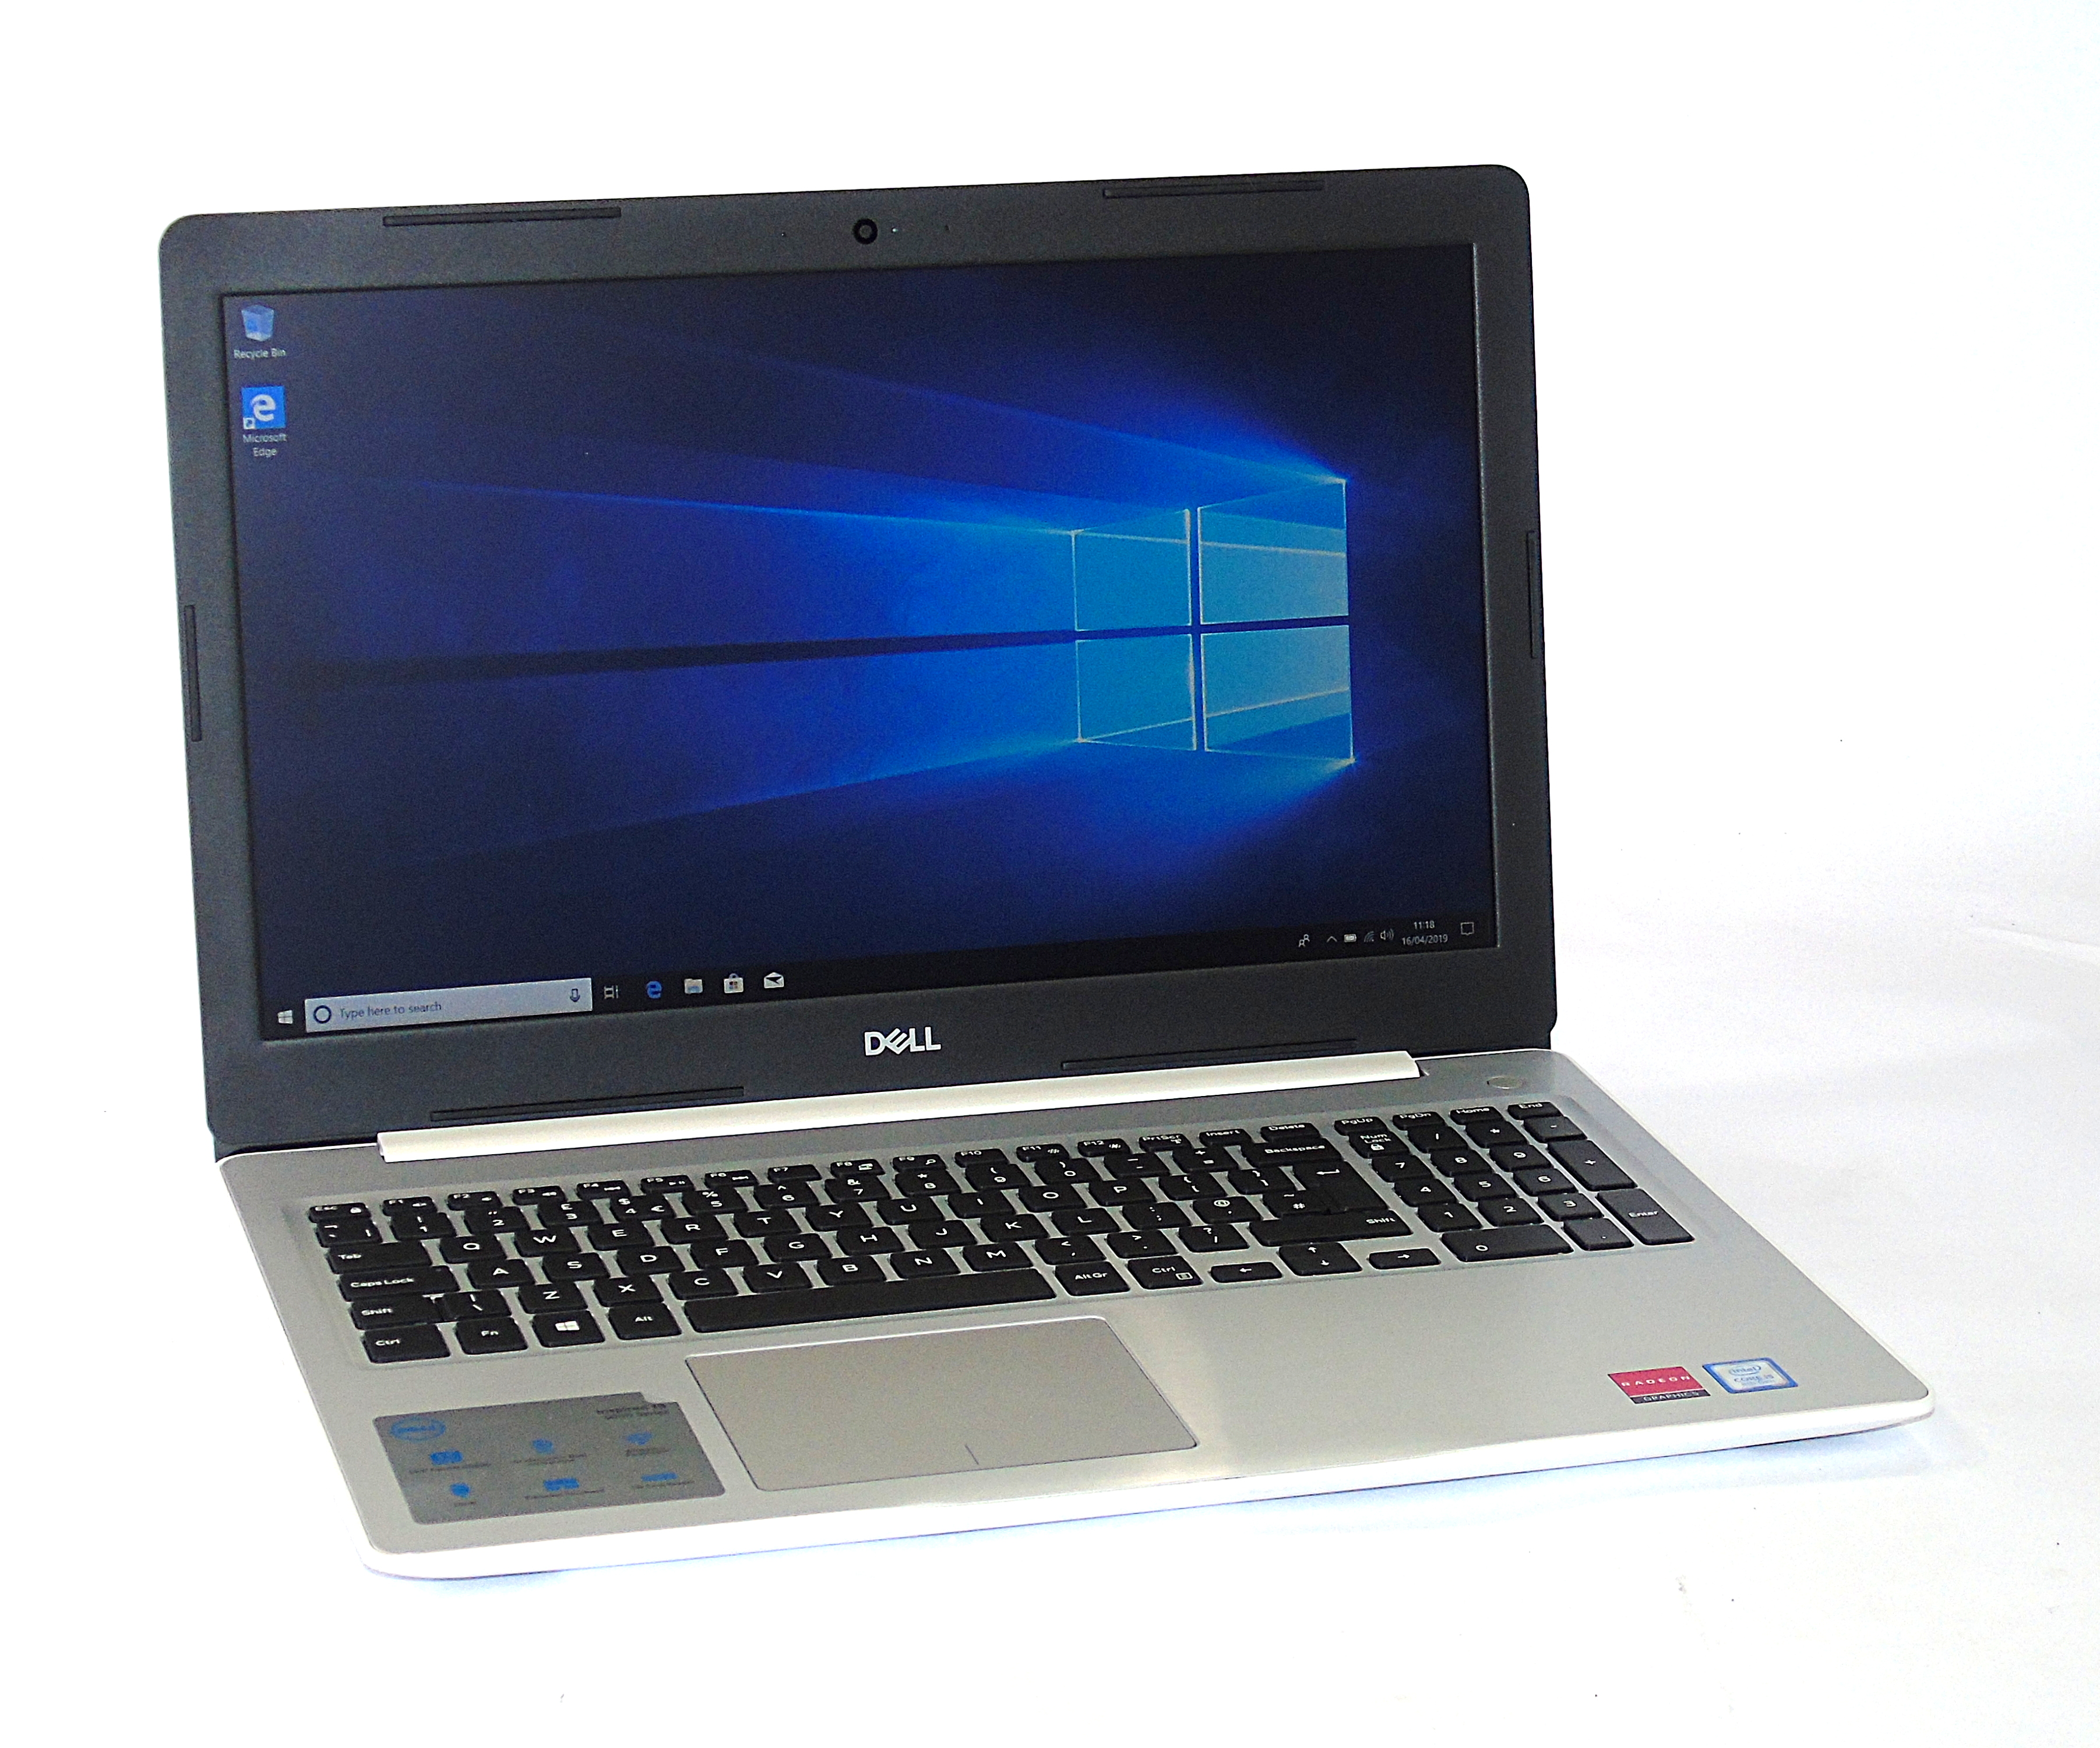 "Dell Inspiron 15 5570 Core i5-8250U 8GB RAM 256GB SSD 15.6"" Display Windows 10"